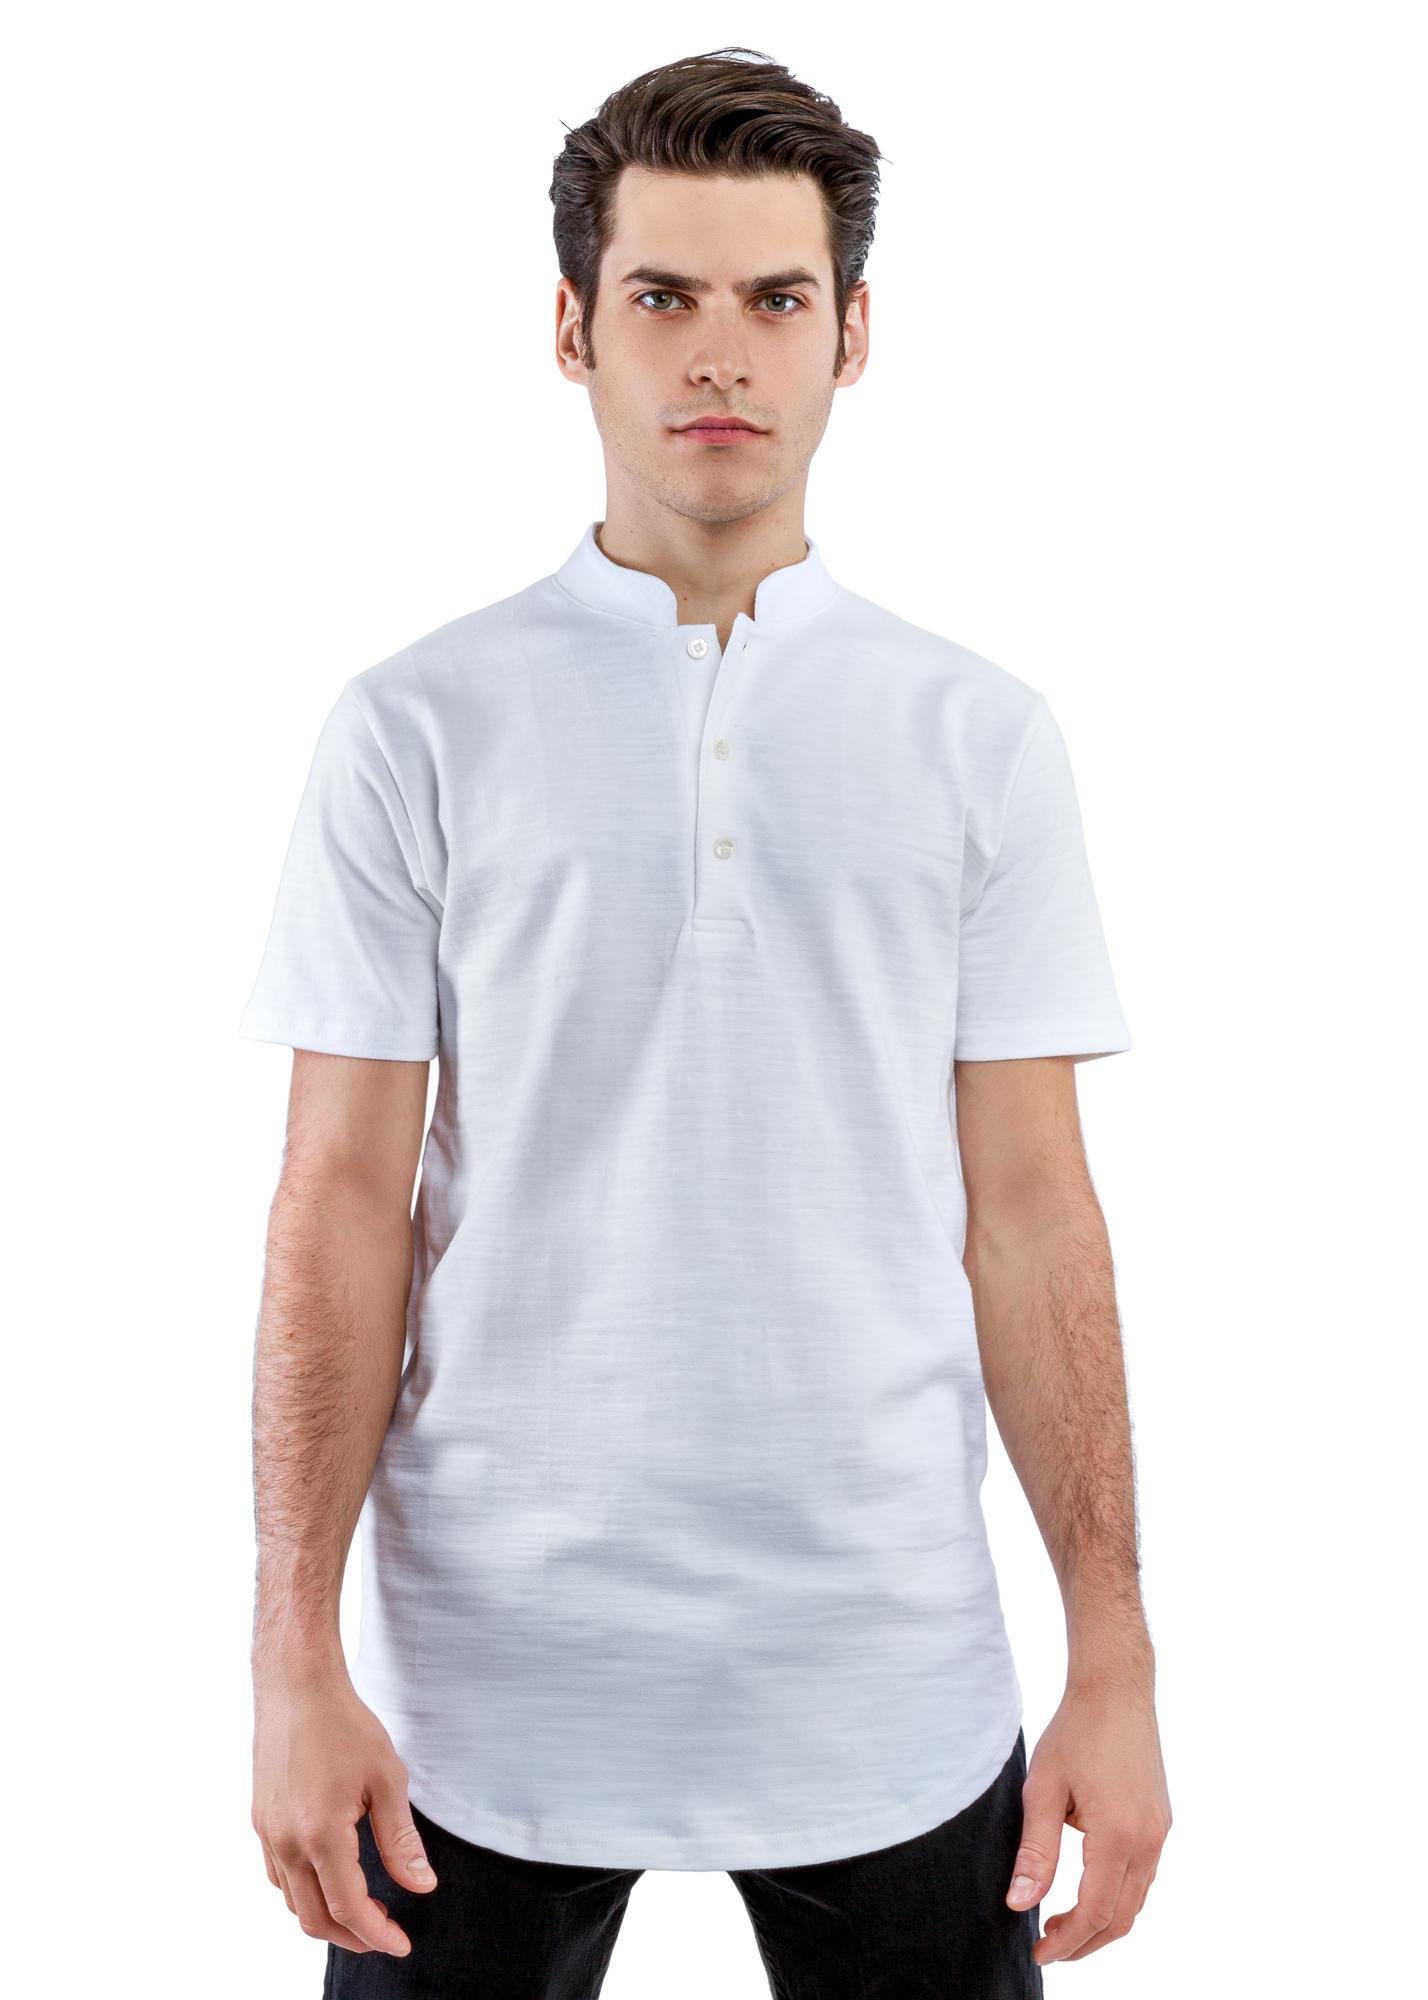 Free shipping and returns on Men's Short Sleeve Henley T-Shirts at 0549sahibi.tk